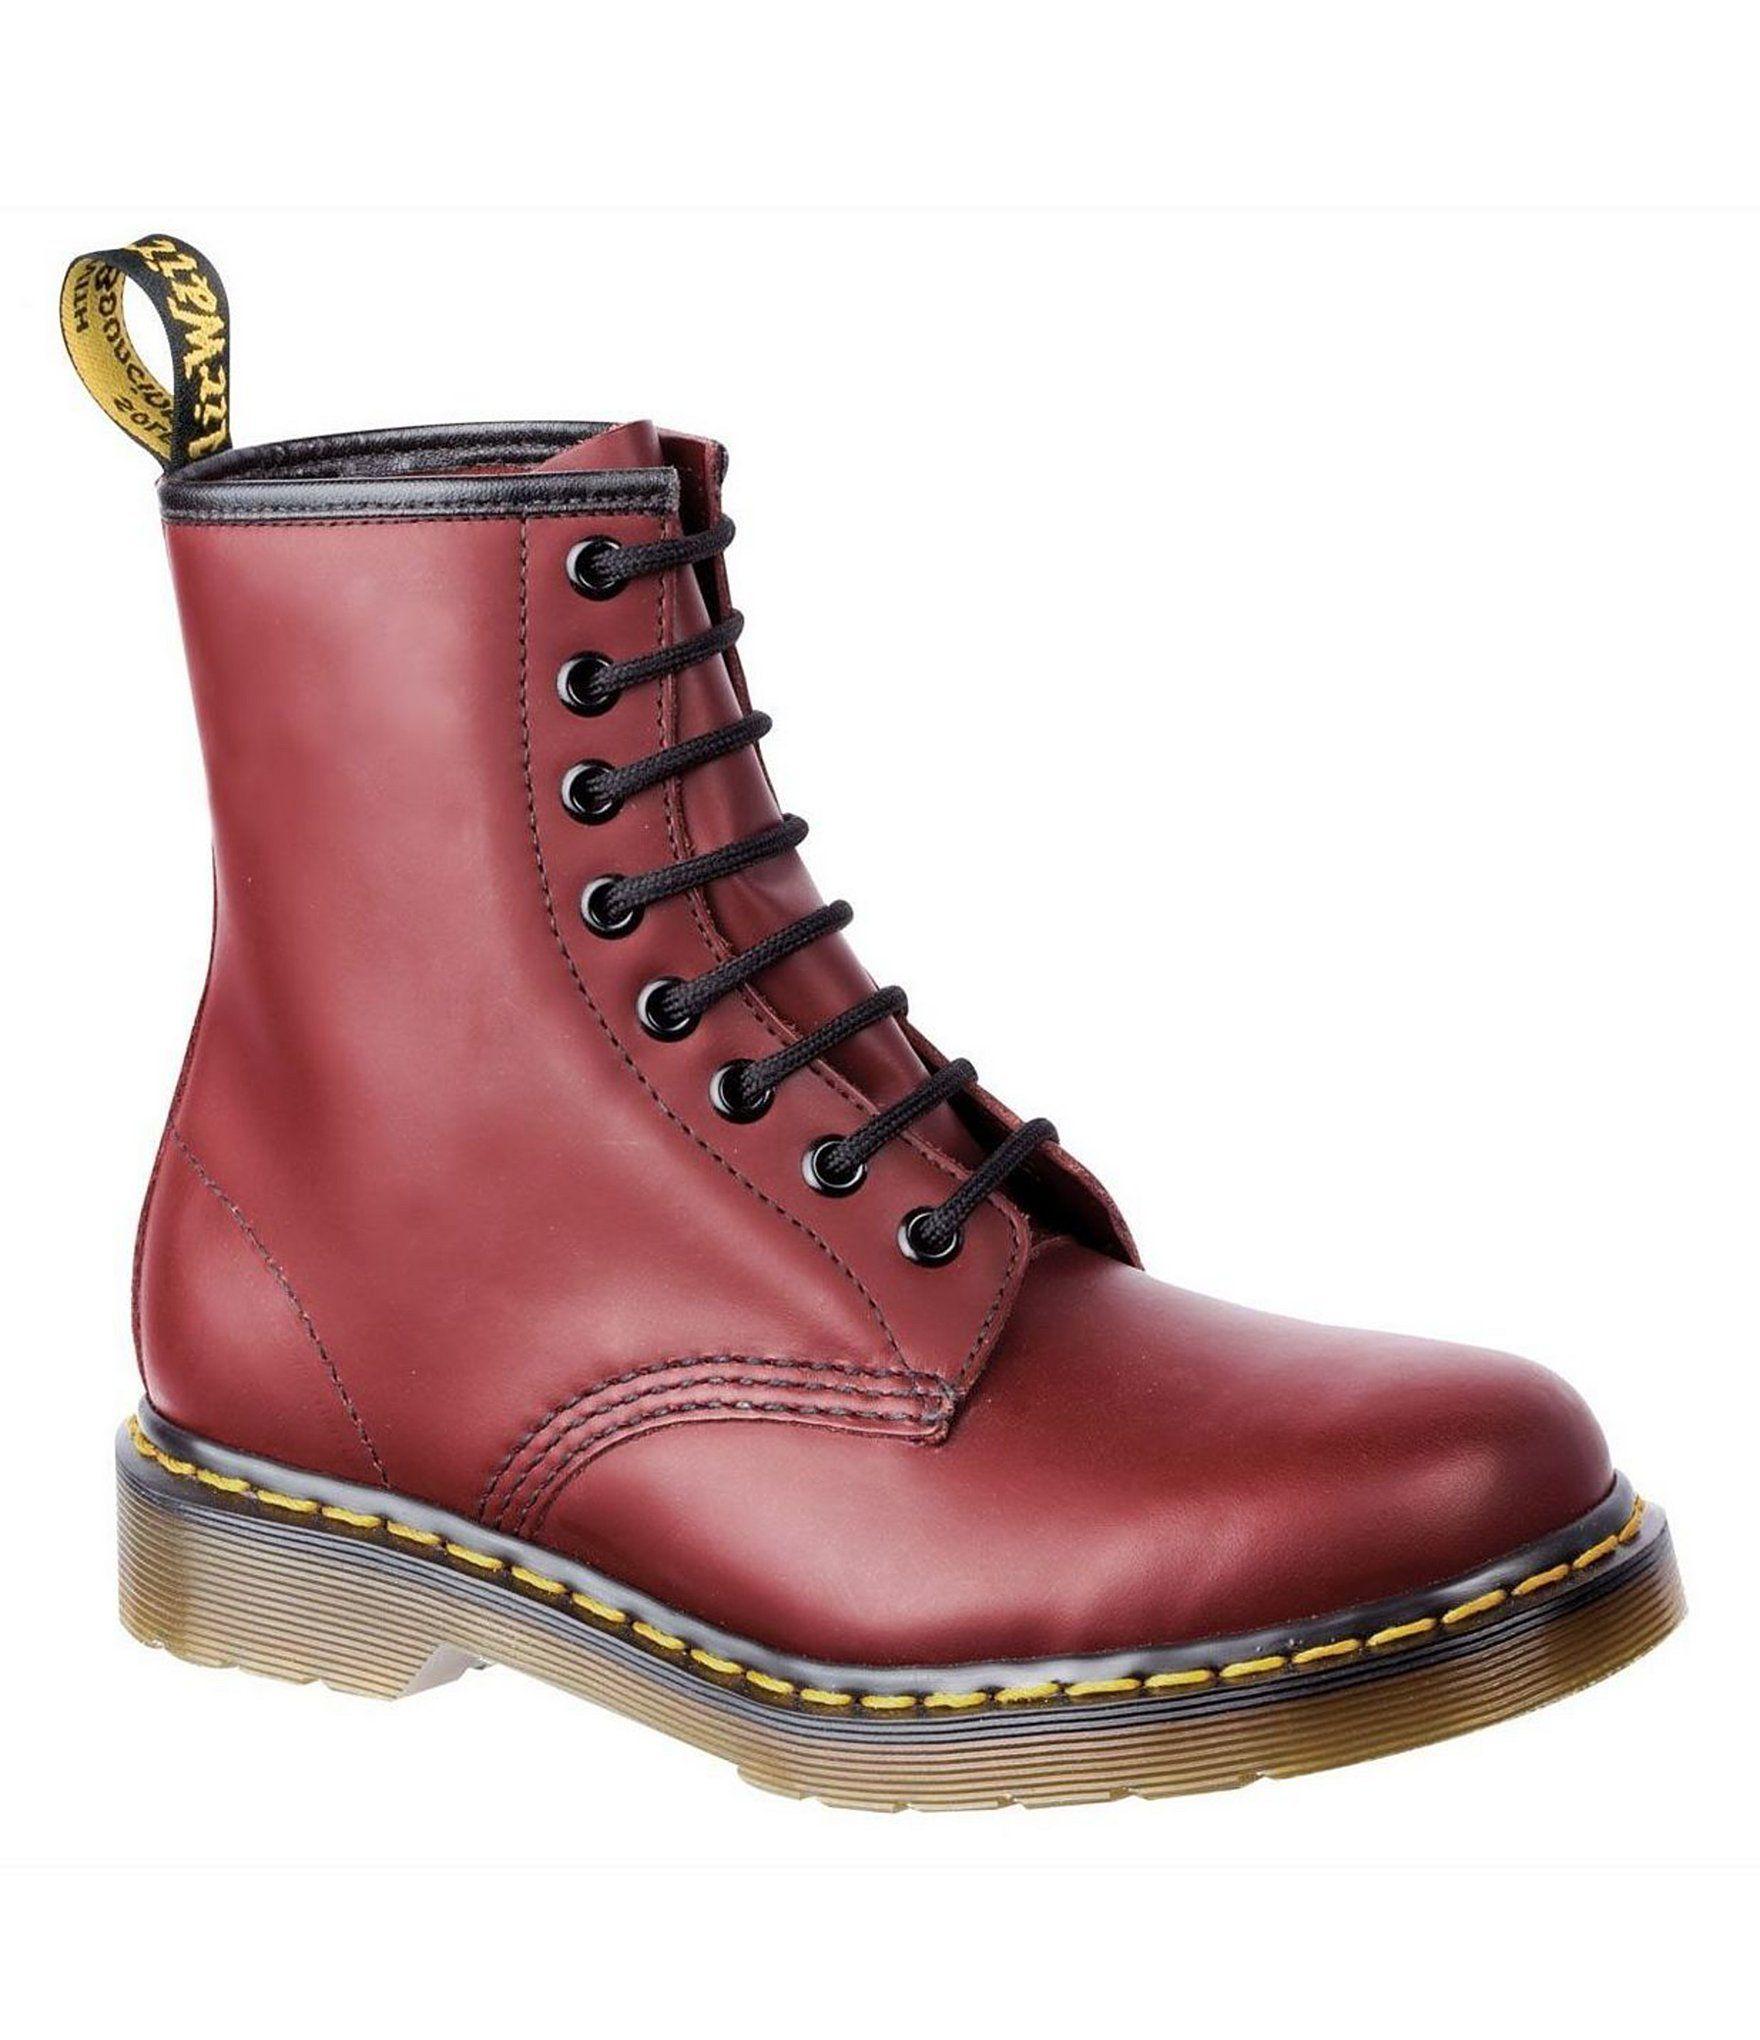 Dr. Martens 1460 Classic 8-Eye Combat Boots | Dillard's 7